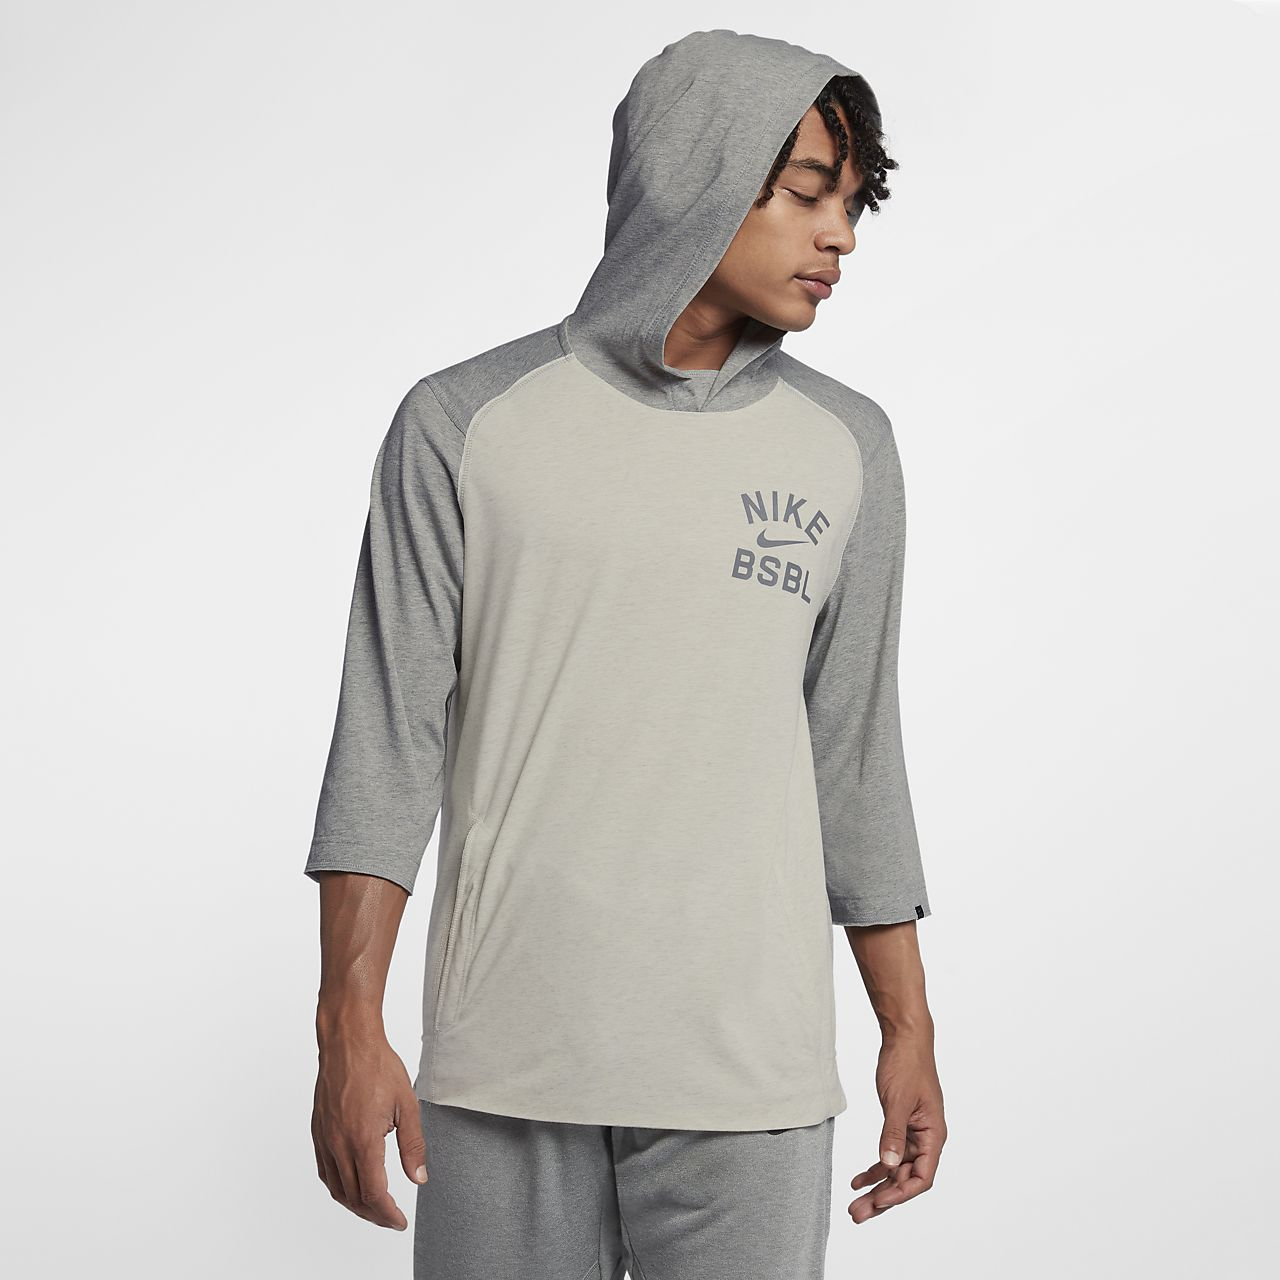 32033a5ff3b Nike Flux Hooded Men s 3 4 Sleeve Baseball Top. Nike.com